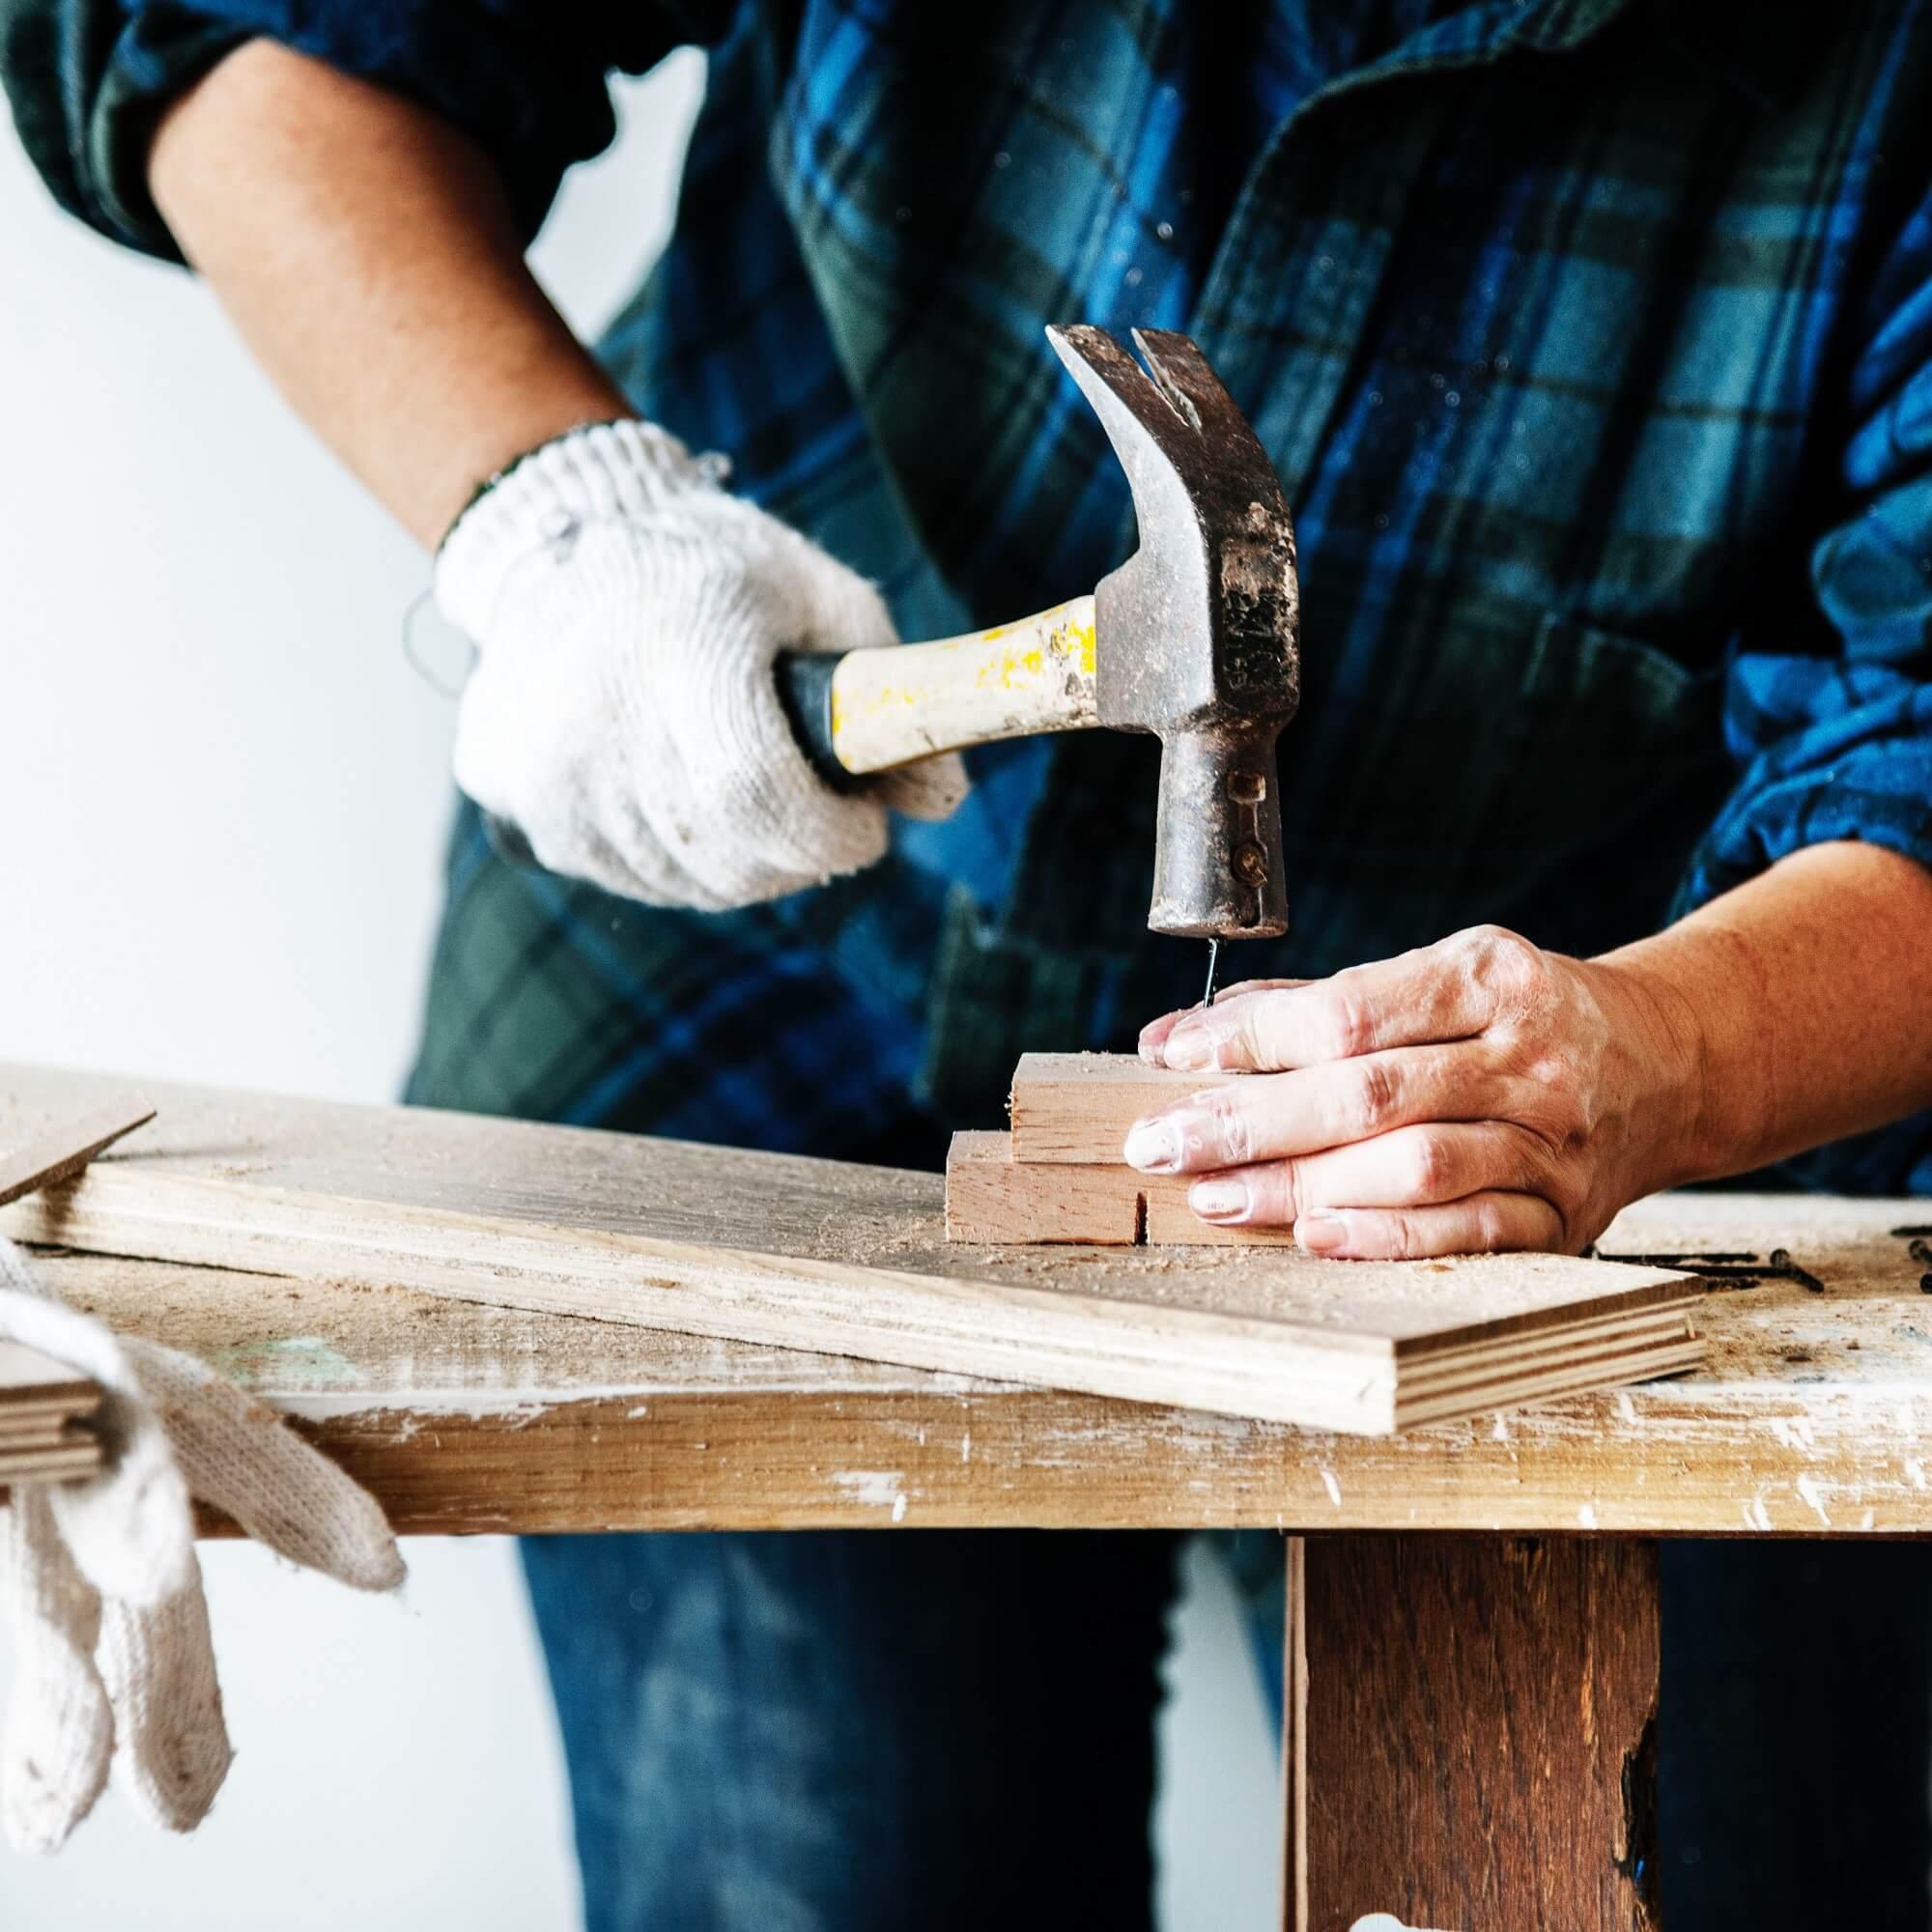 Norh Tømrer Charlottenlund. Alt i tømrerarbejde hos Norh tømrer Charlottenlund